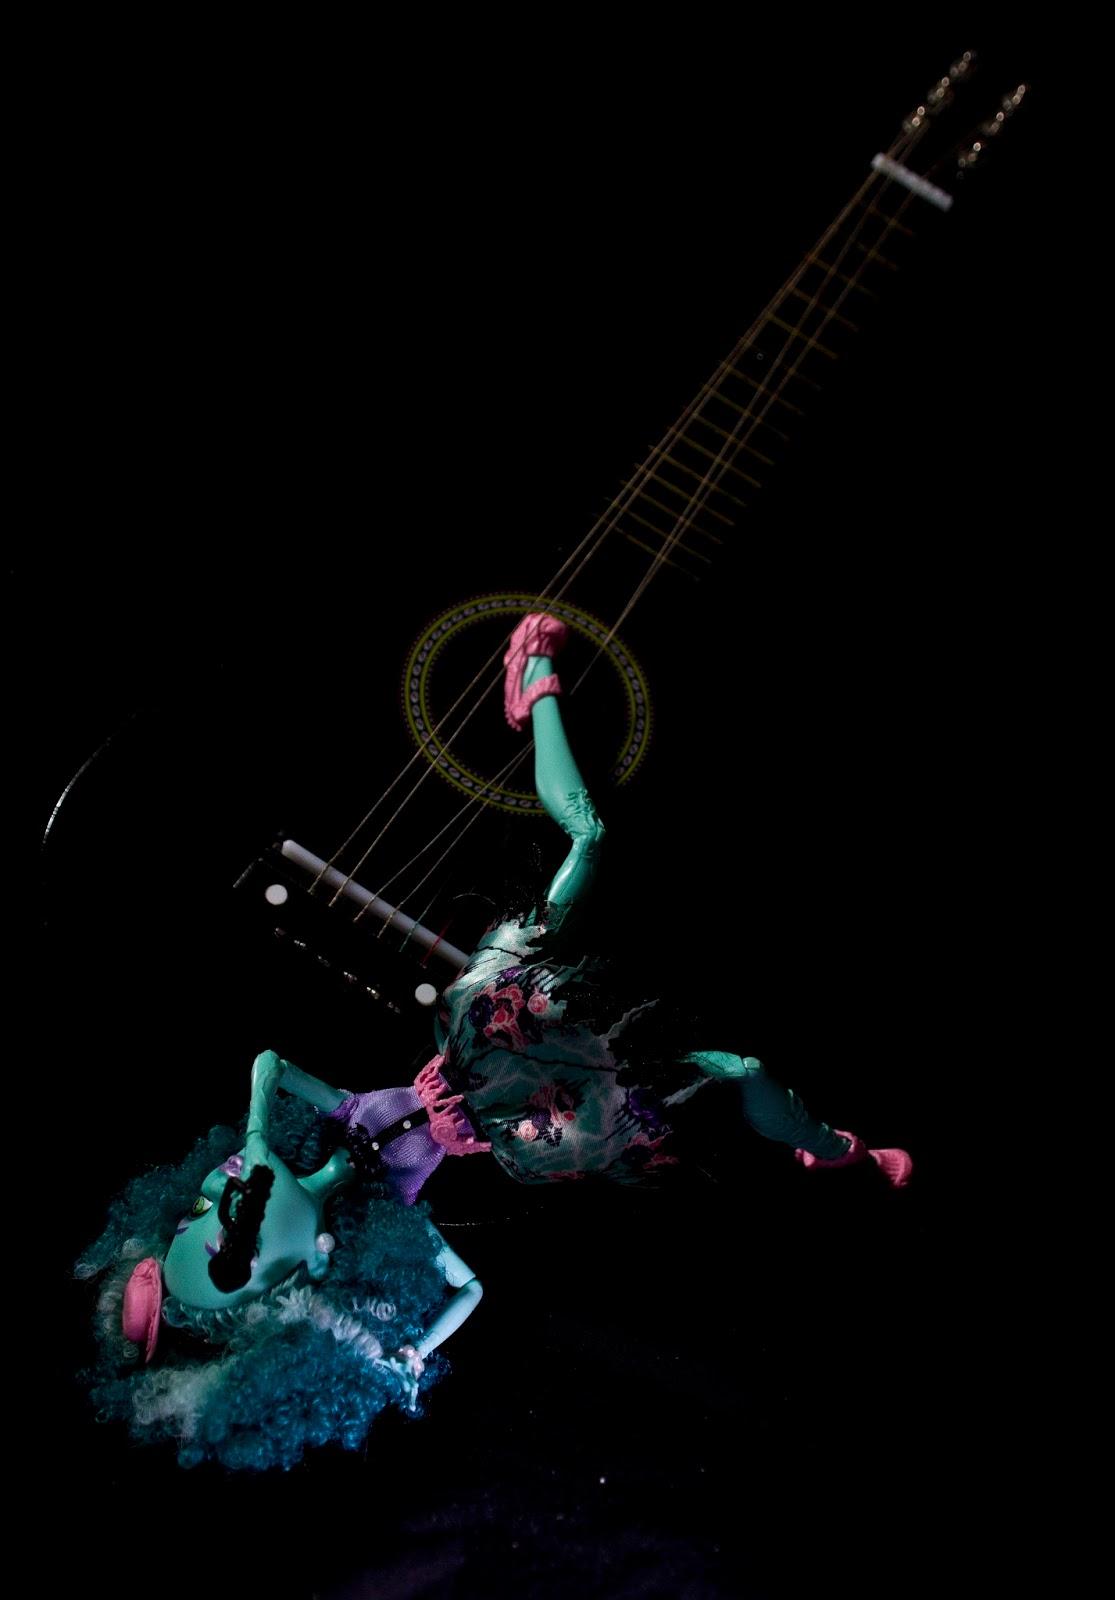 this poor concert singer got killed for her love for rock n roll